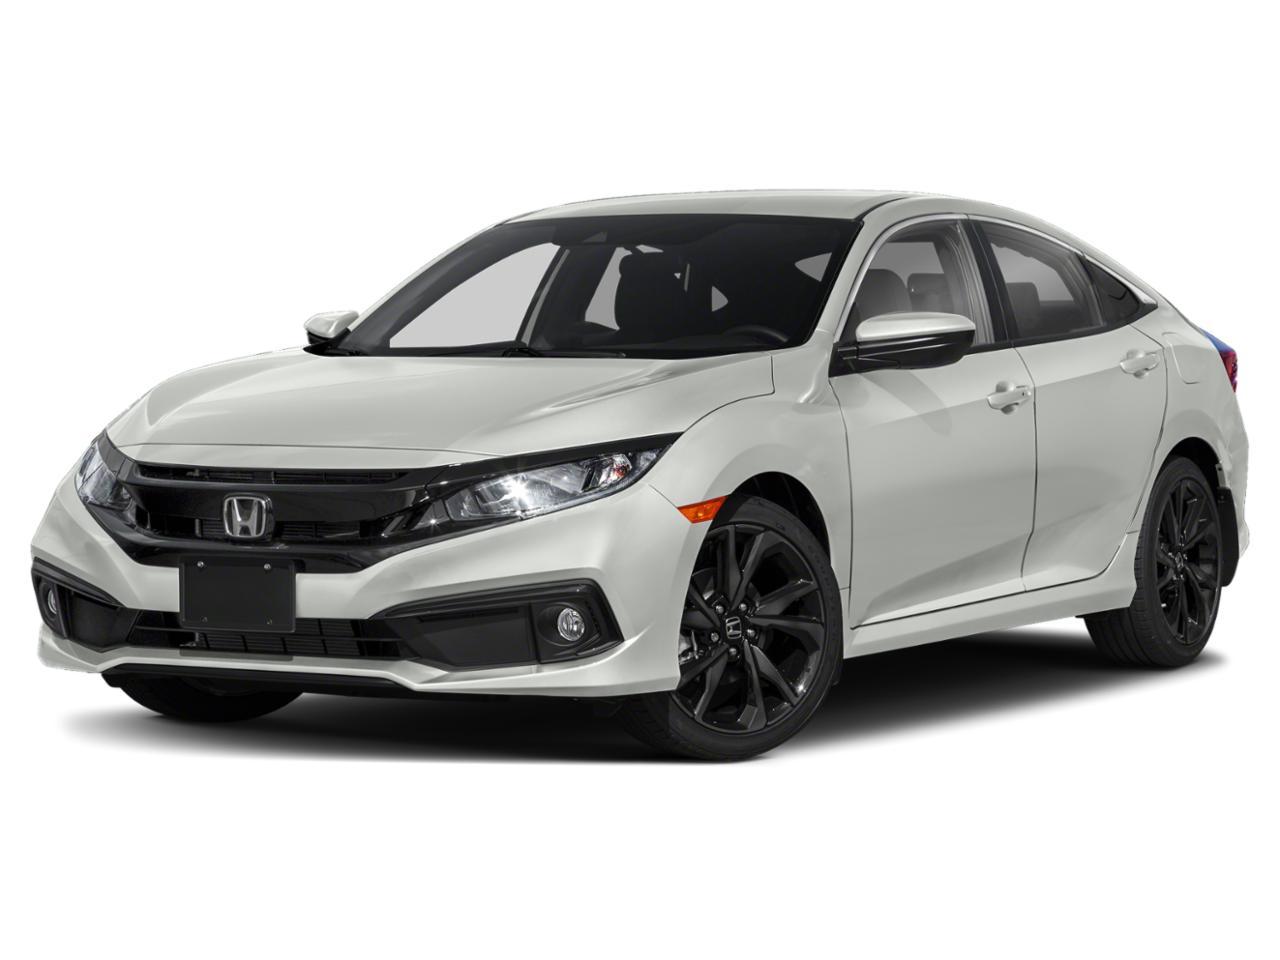 2019 Honda Civic Sedan Vehicle Photo in Colorado Springs, CO 80920